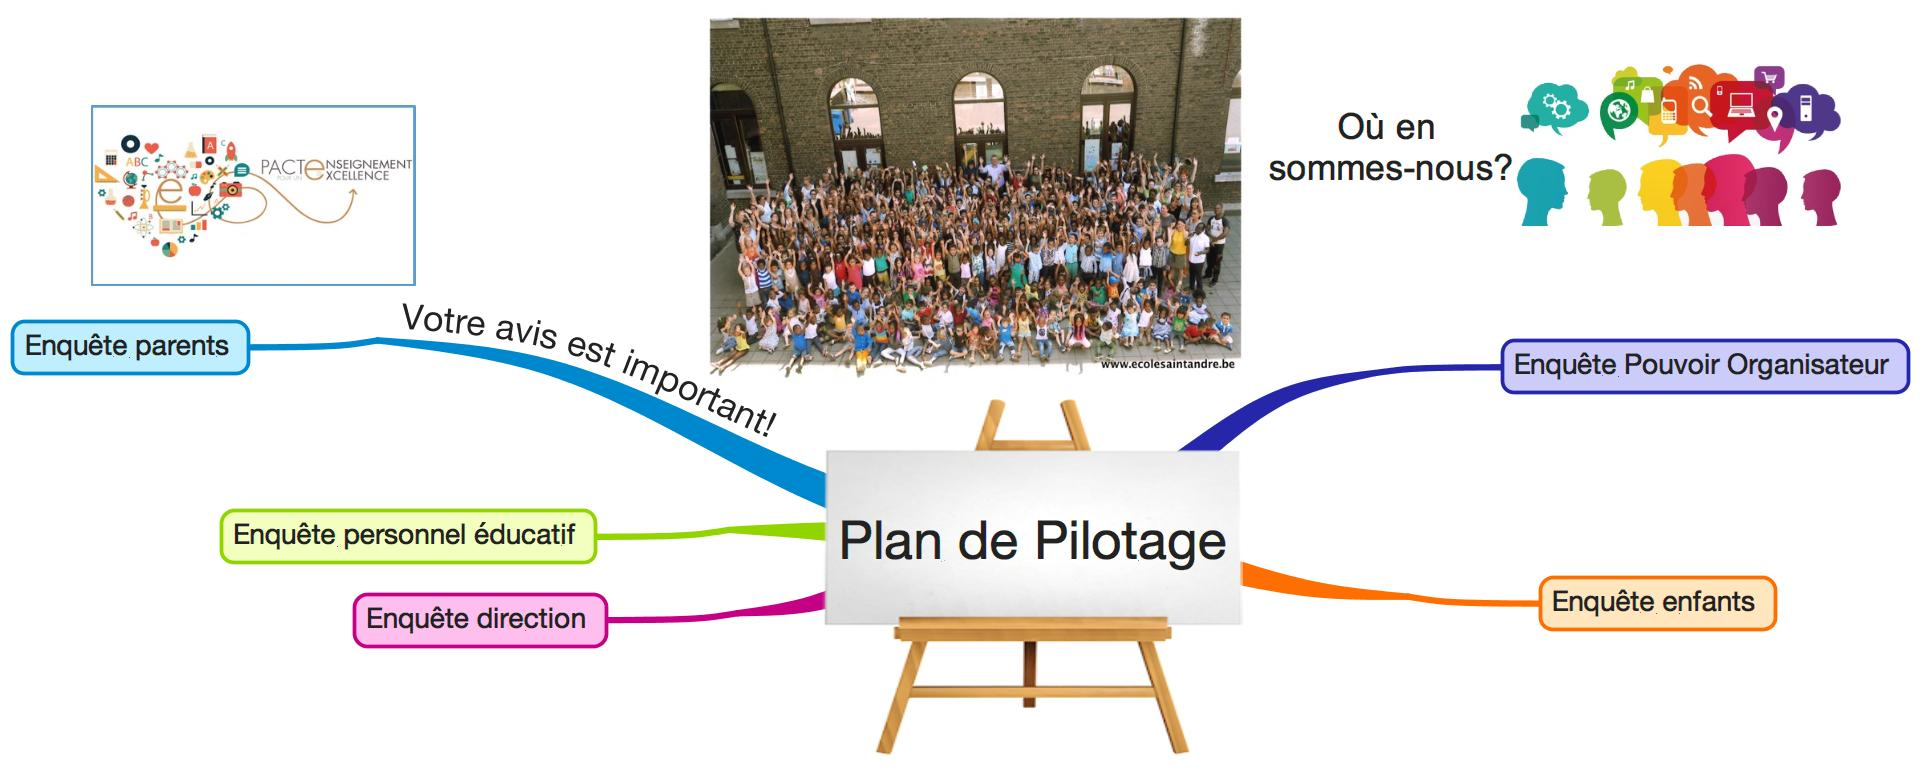 Plan de pilotage